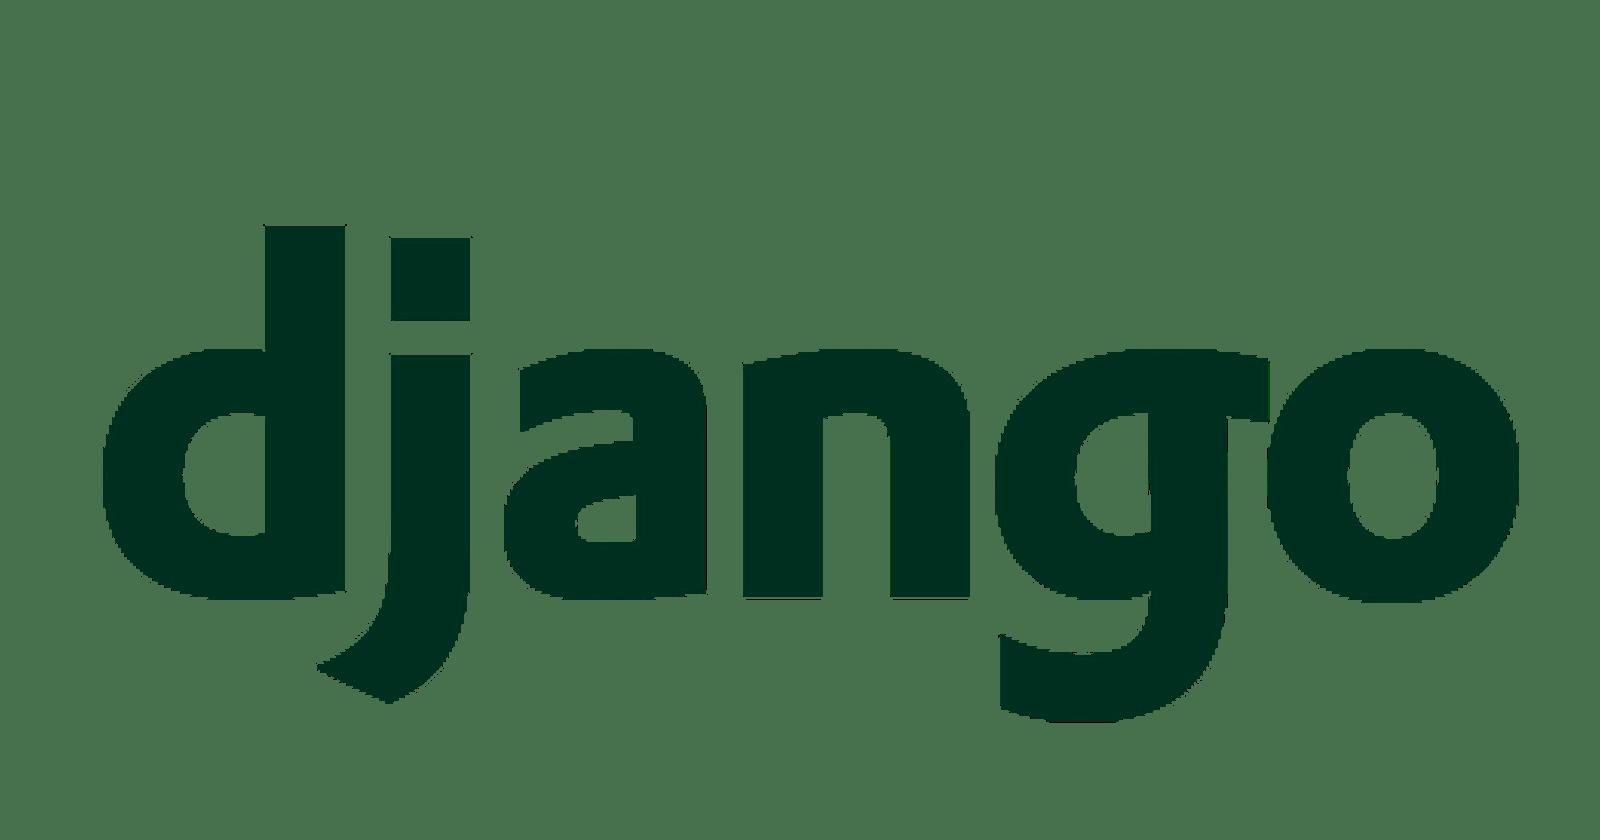 First steps with Django - Part 3